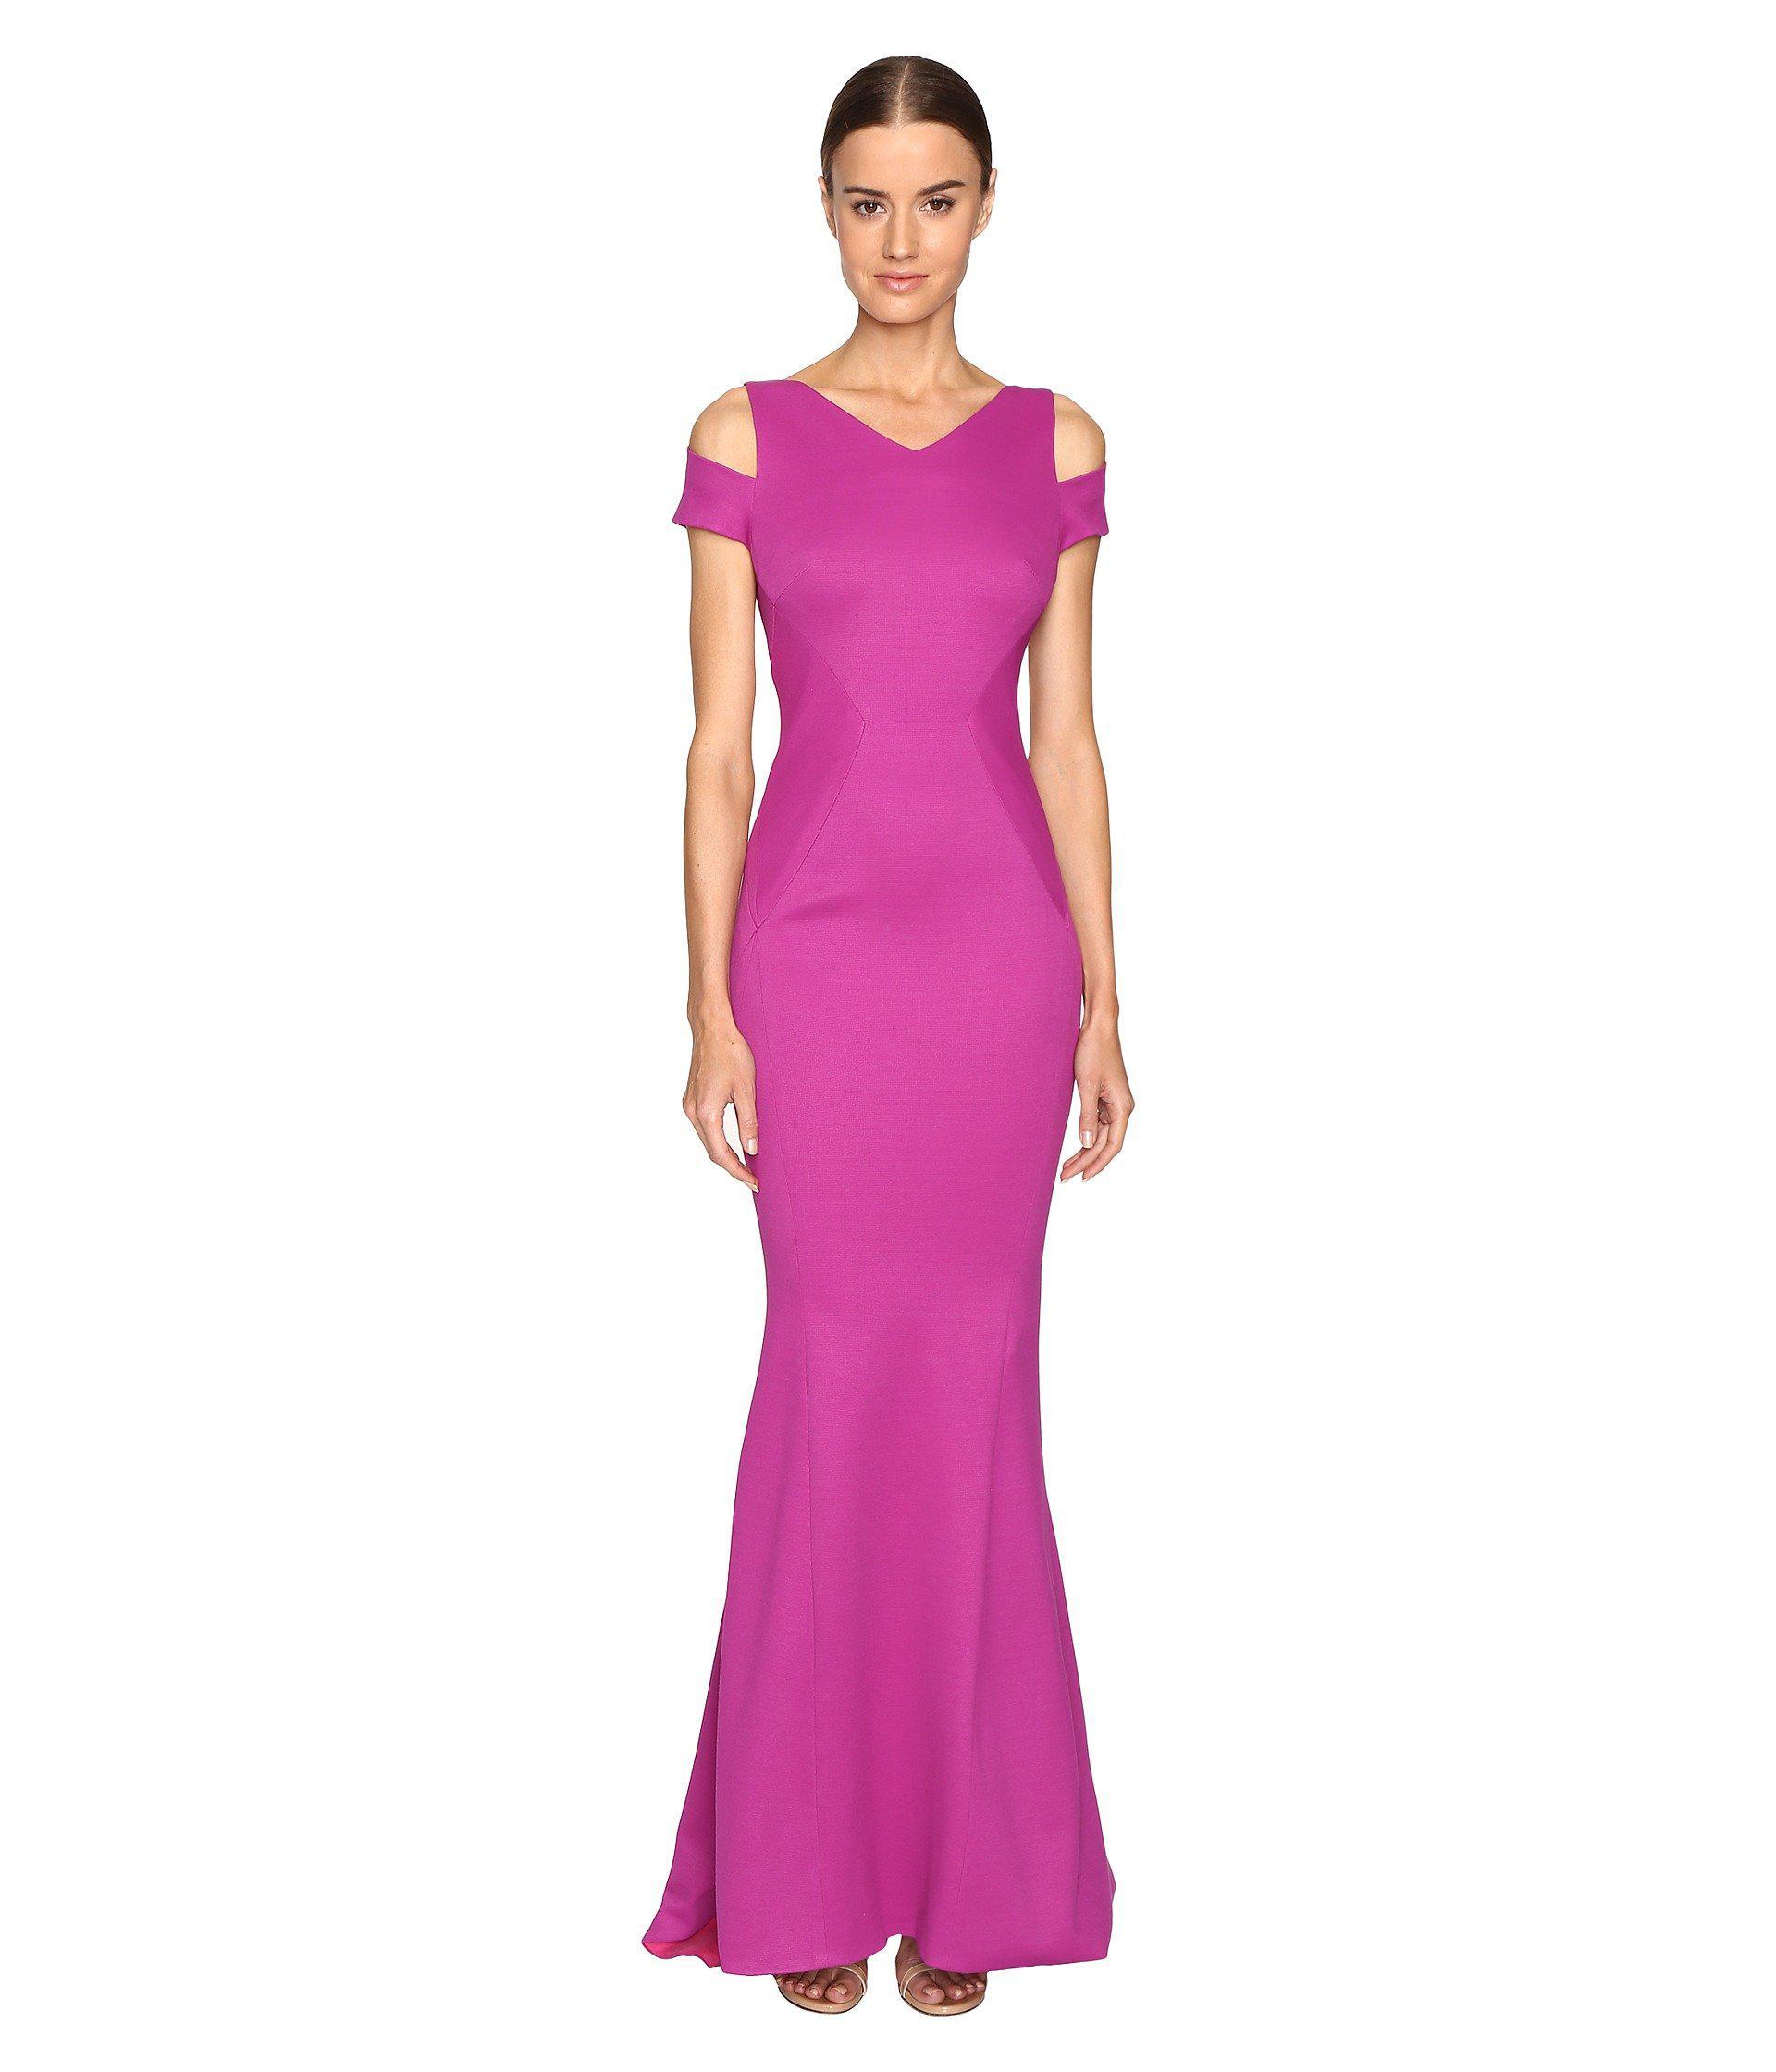 Lyst - Zac Posen Bondage Jersey Cold Shoulder Gown in Purple